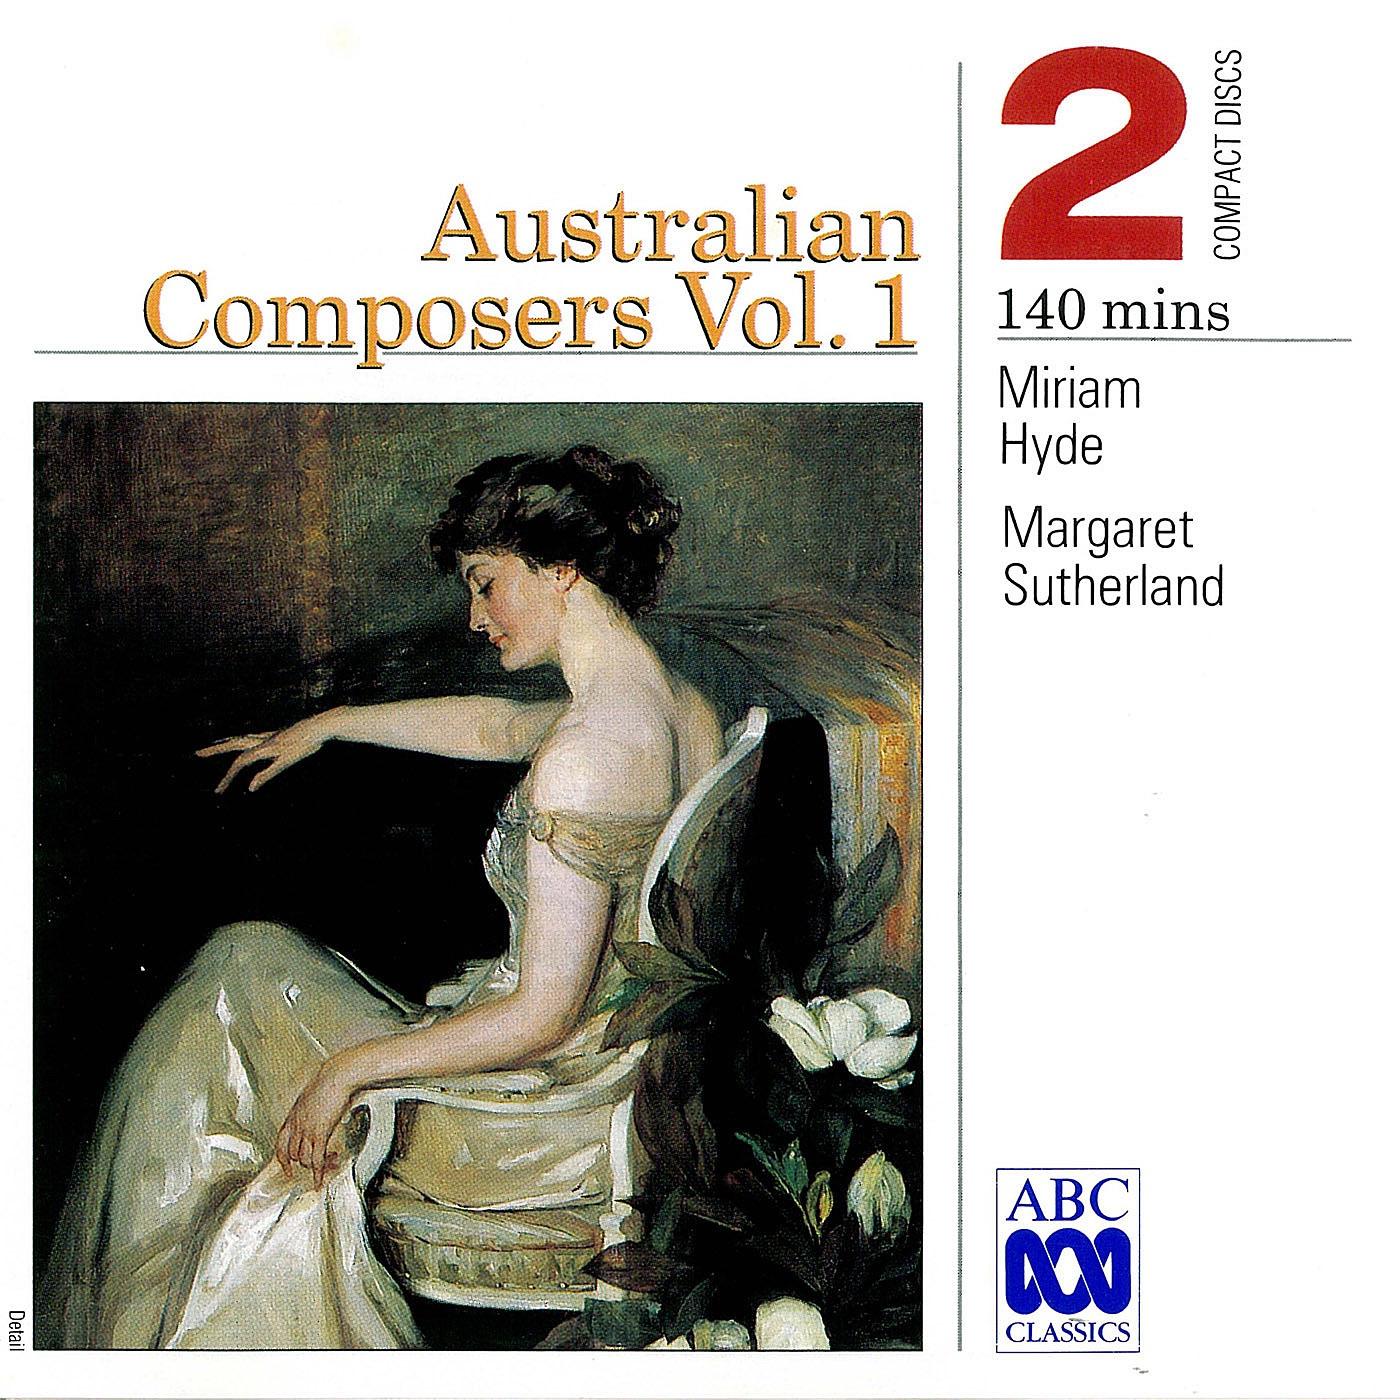 Concerto Grosso: II. Adagio